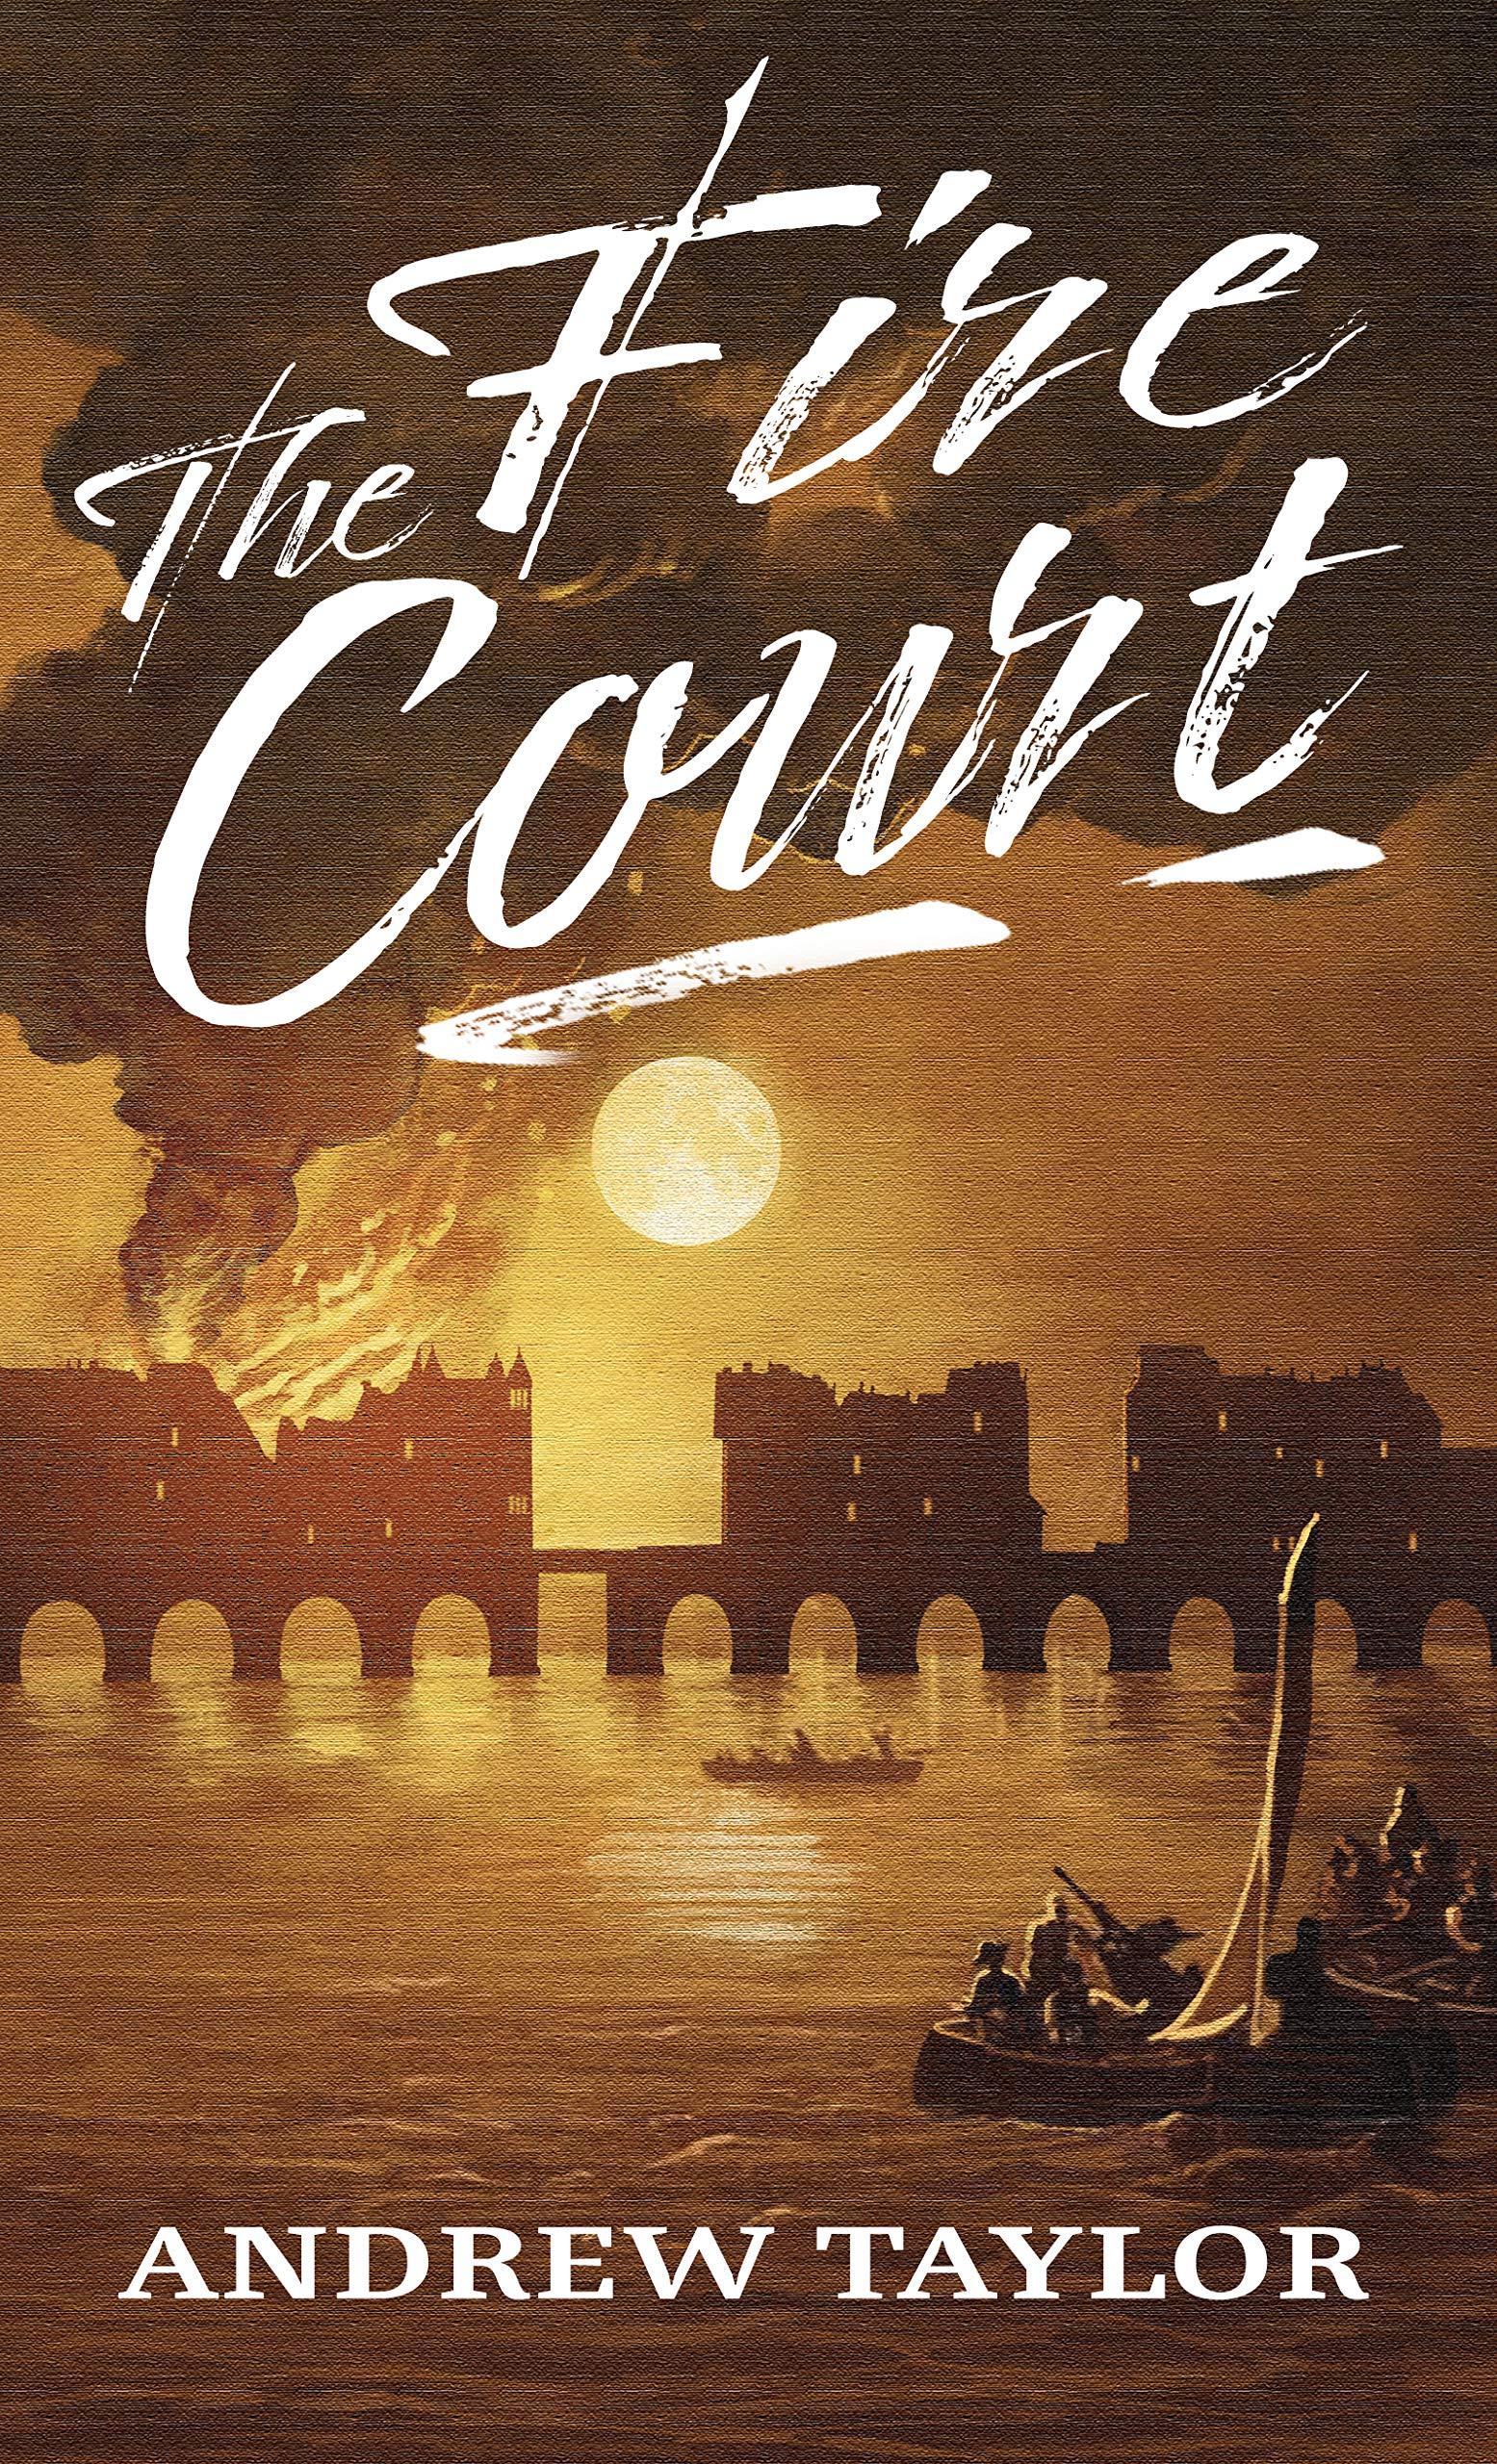 The Fire Court Thorndike Press Large Print Mystery Series: Amazon.es: Taylor, Andrew: Libros en idiomas extranjeros